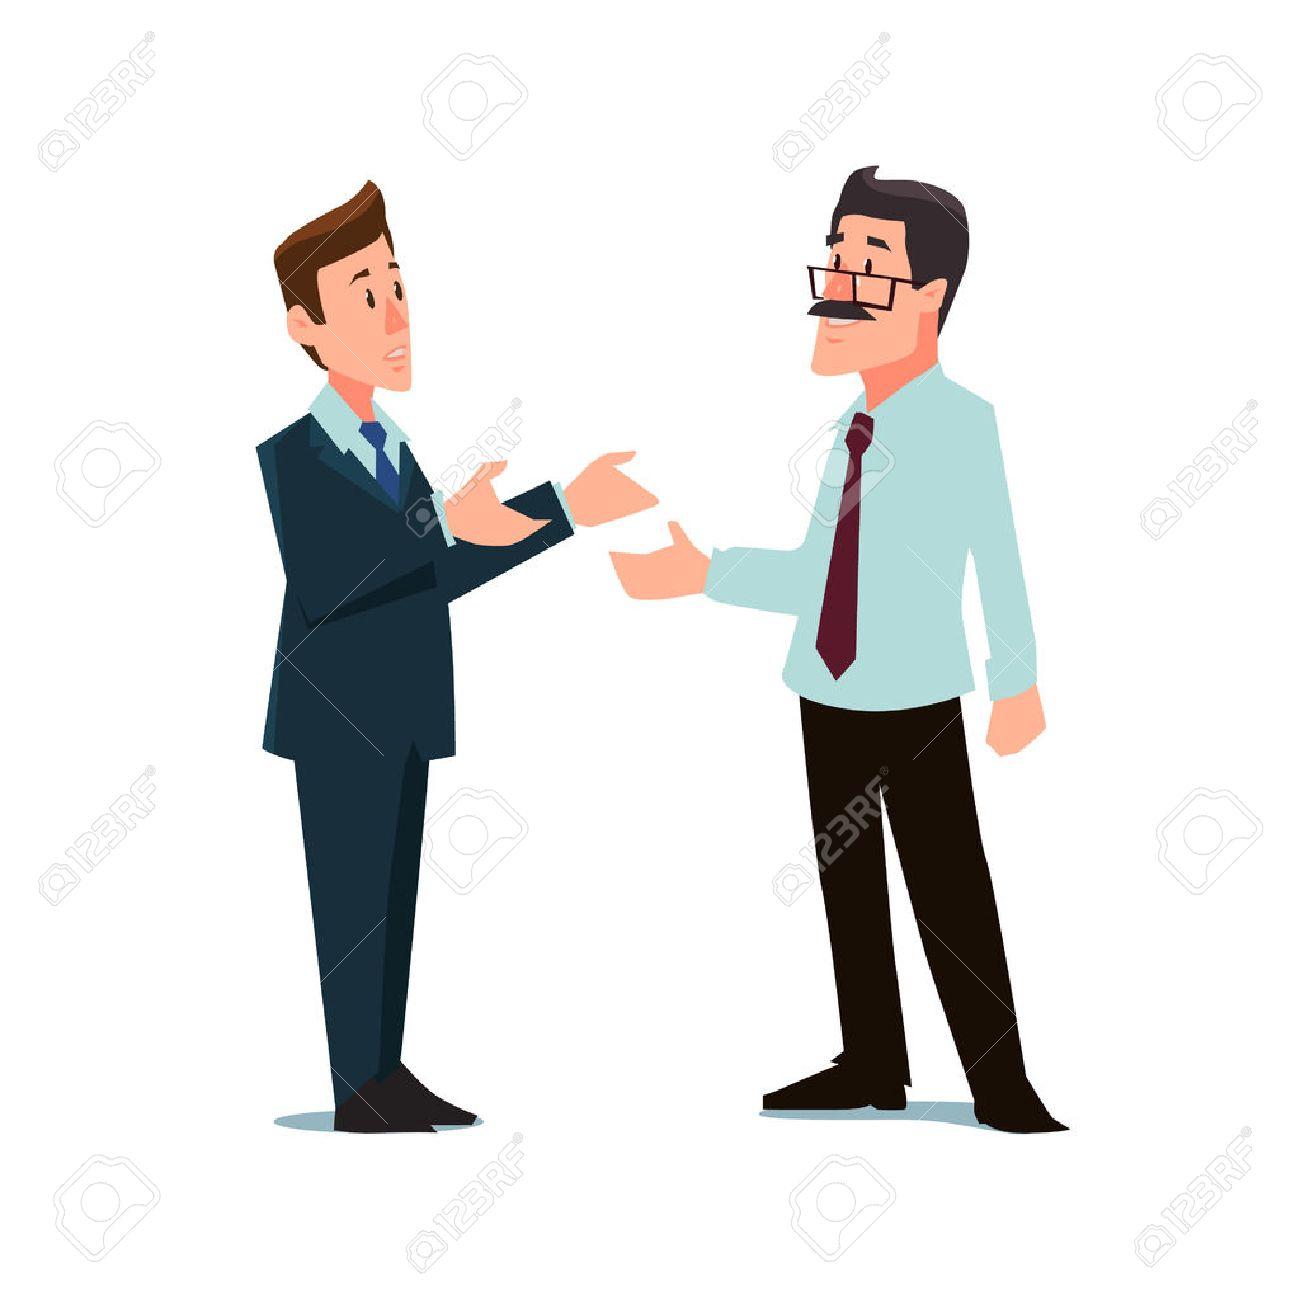 cartoon characters, businessmen, collaboration, teamwork negotiation, vector illustration - 52813537